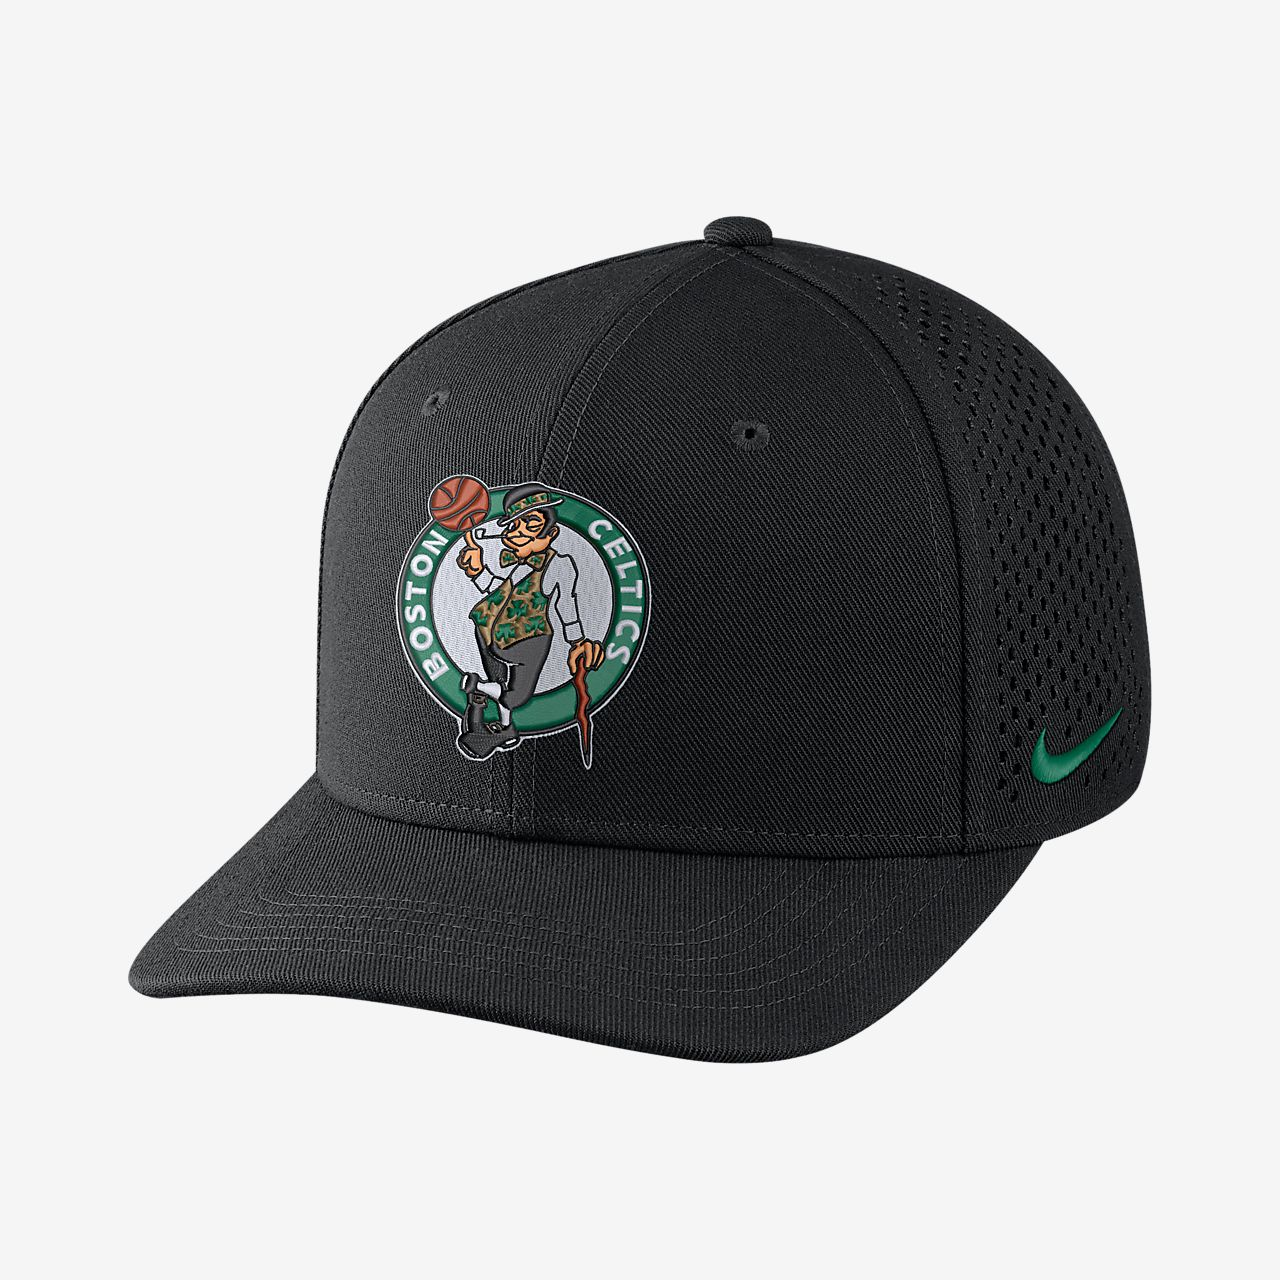 Boston Celtics Nike AeroBill Classic99 中性可調式 NBA 帽款